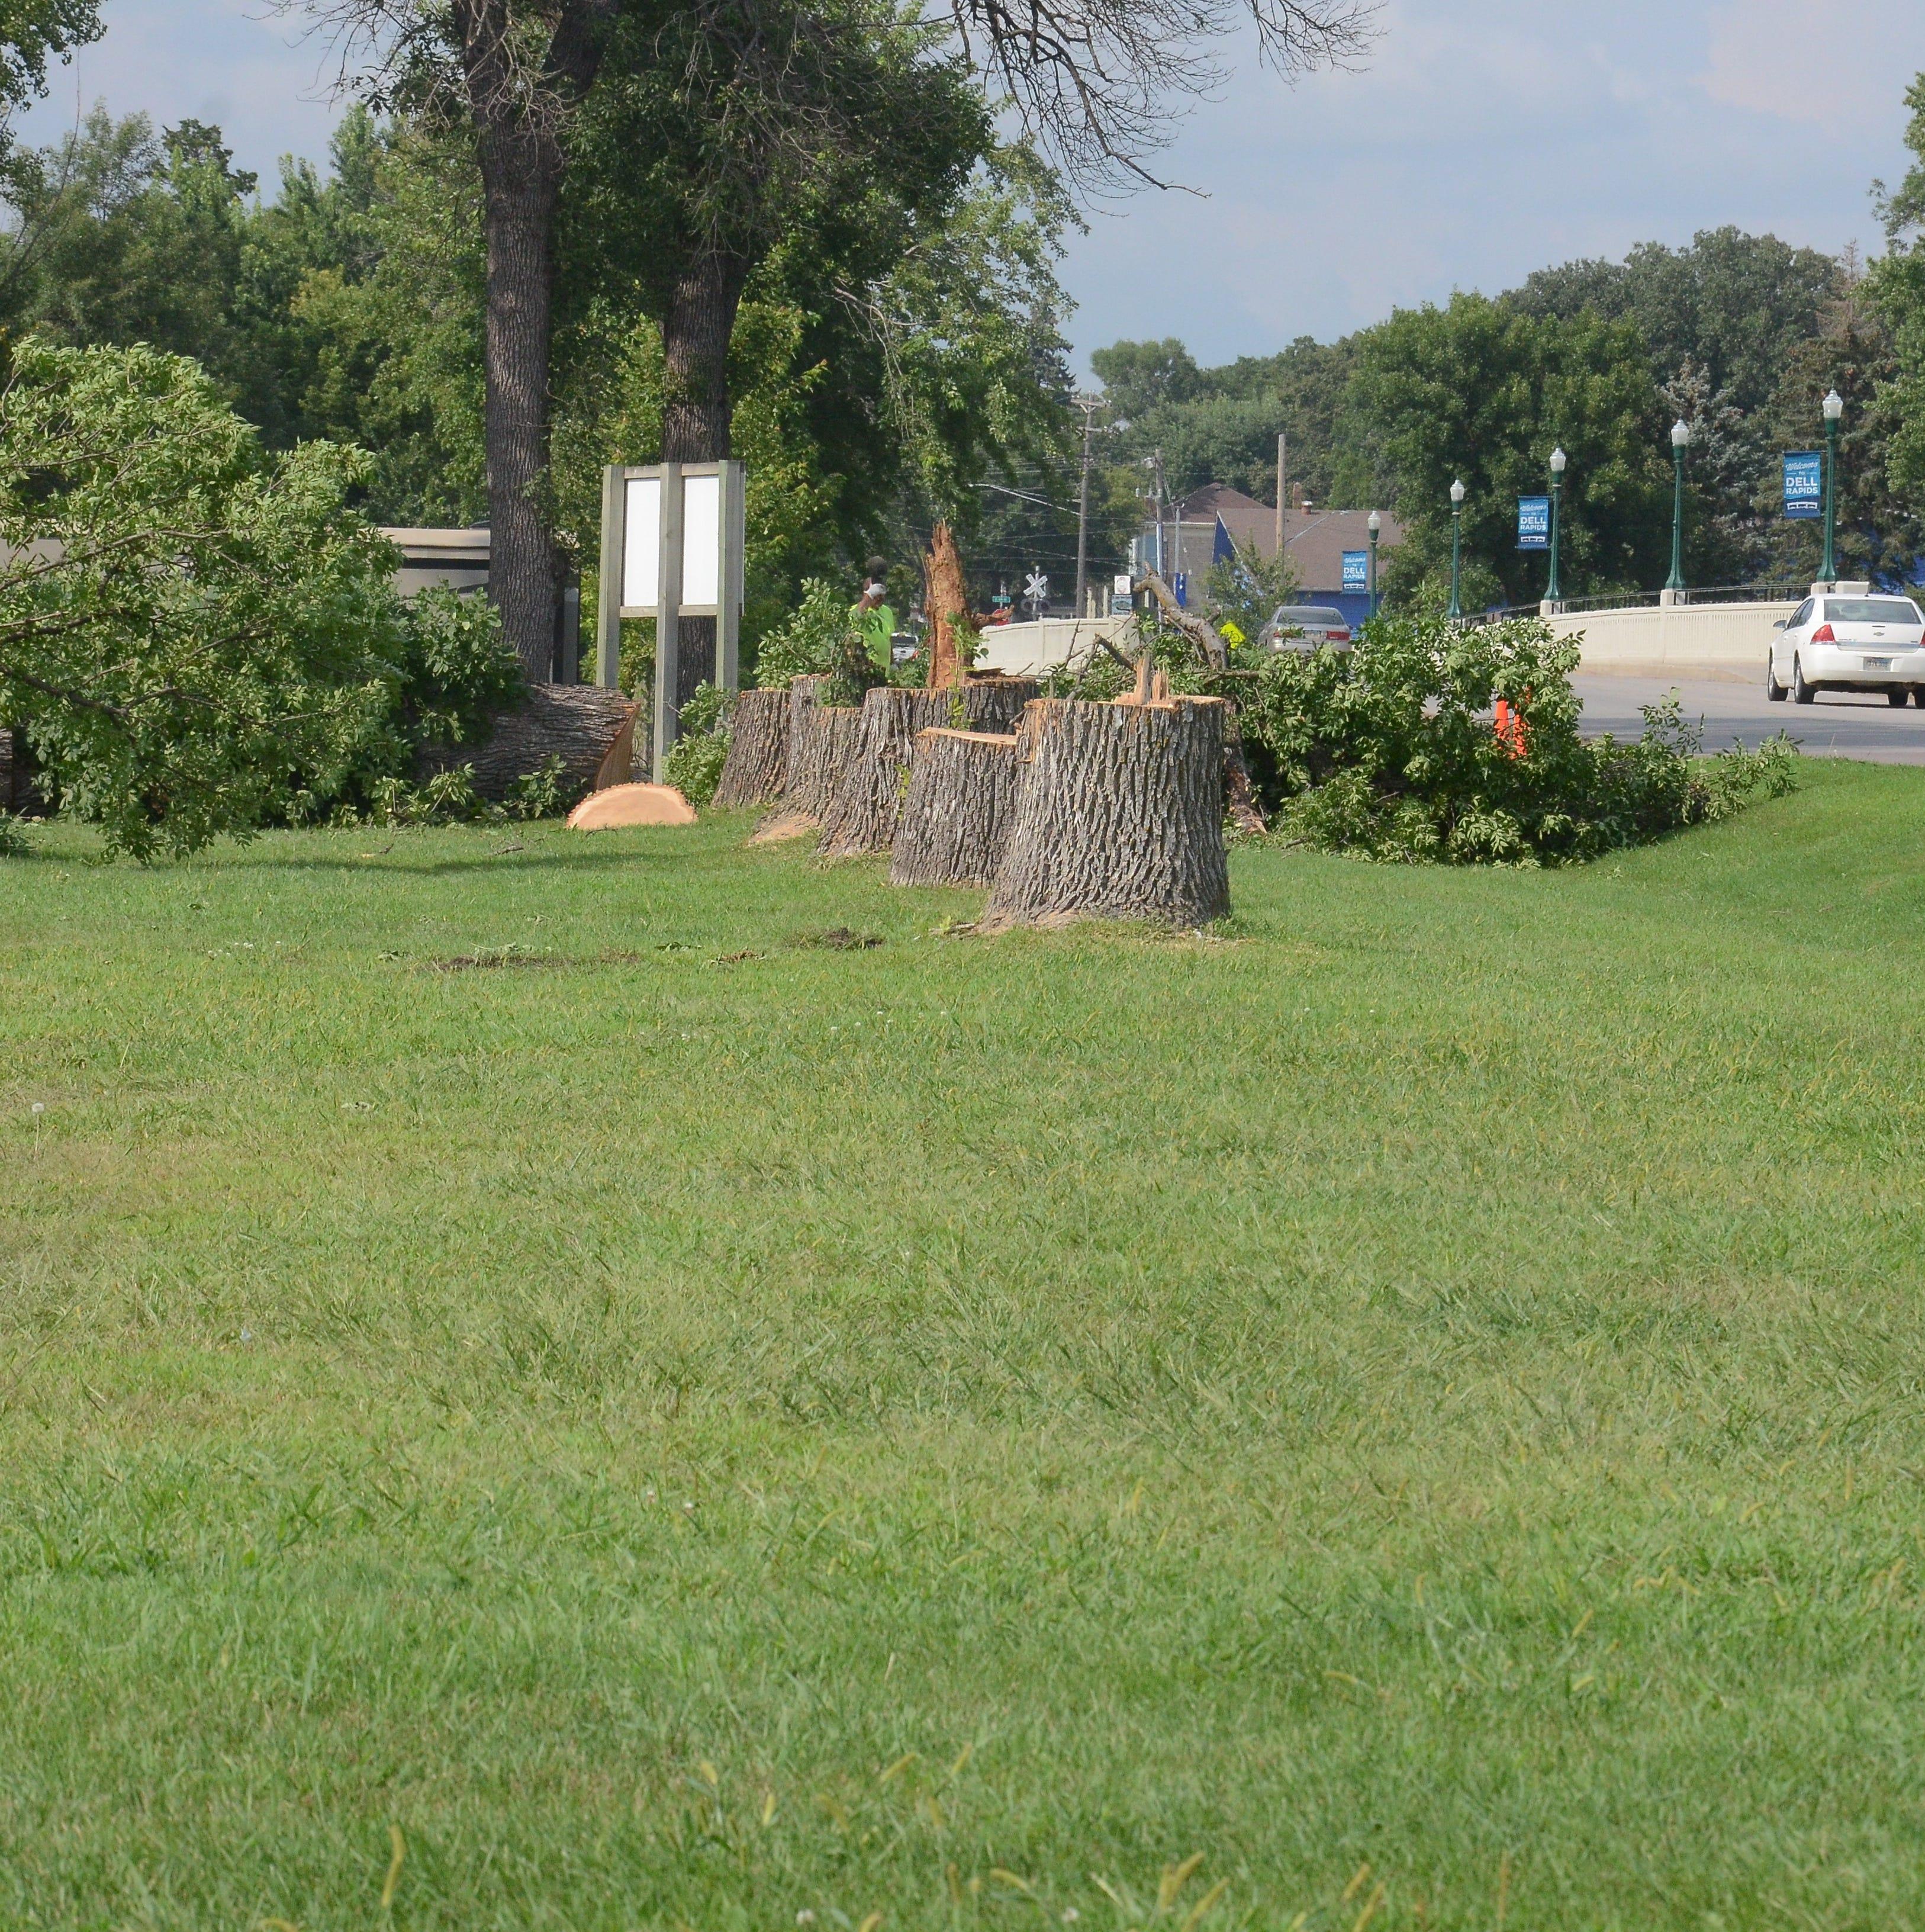 Ash trees come down around Rickeman, campground